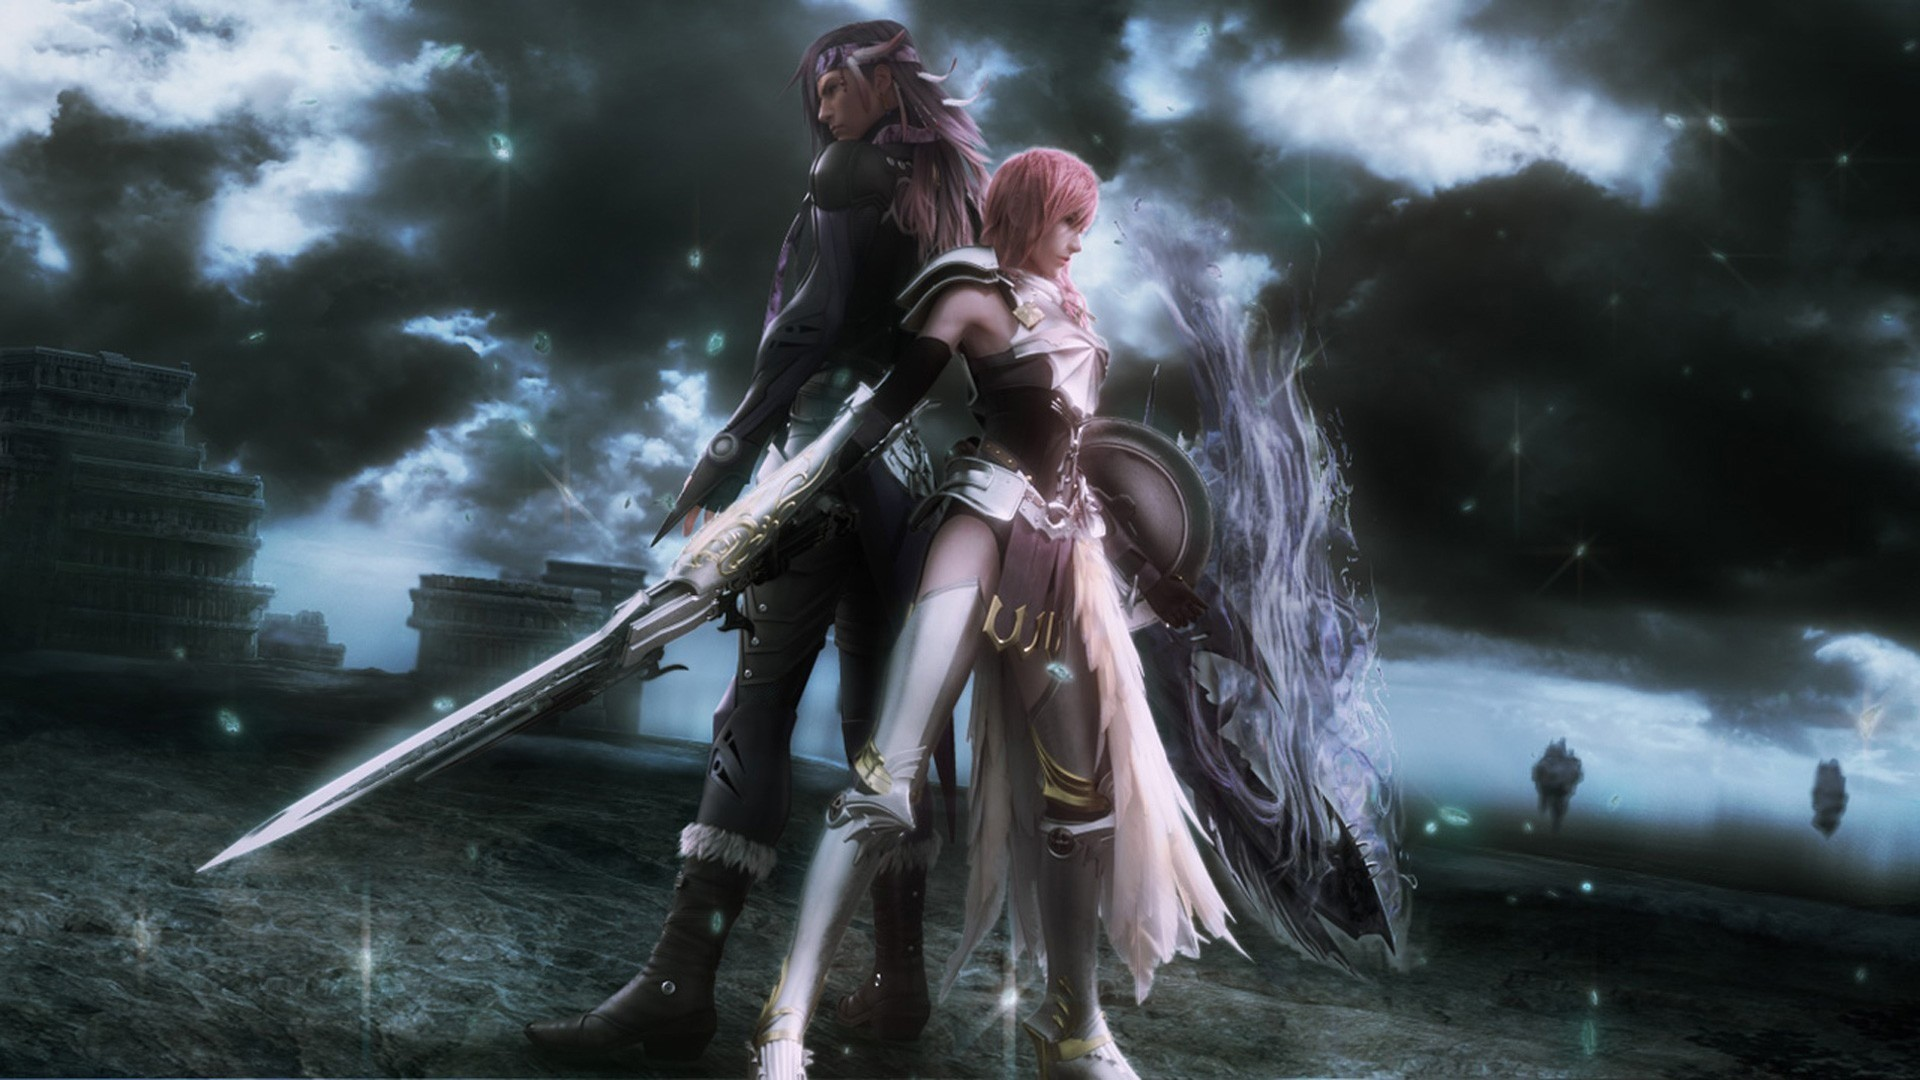 Final Fantasy XIII-2 – 1920 x 1080 – HD Wallpaper